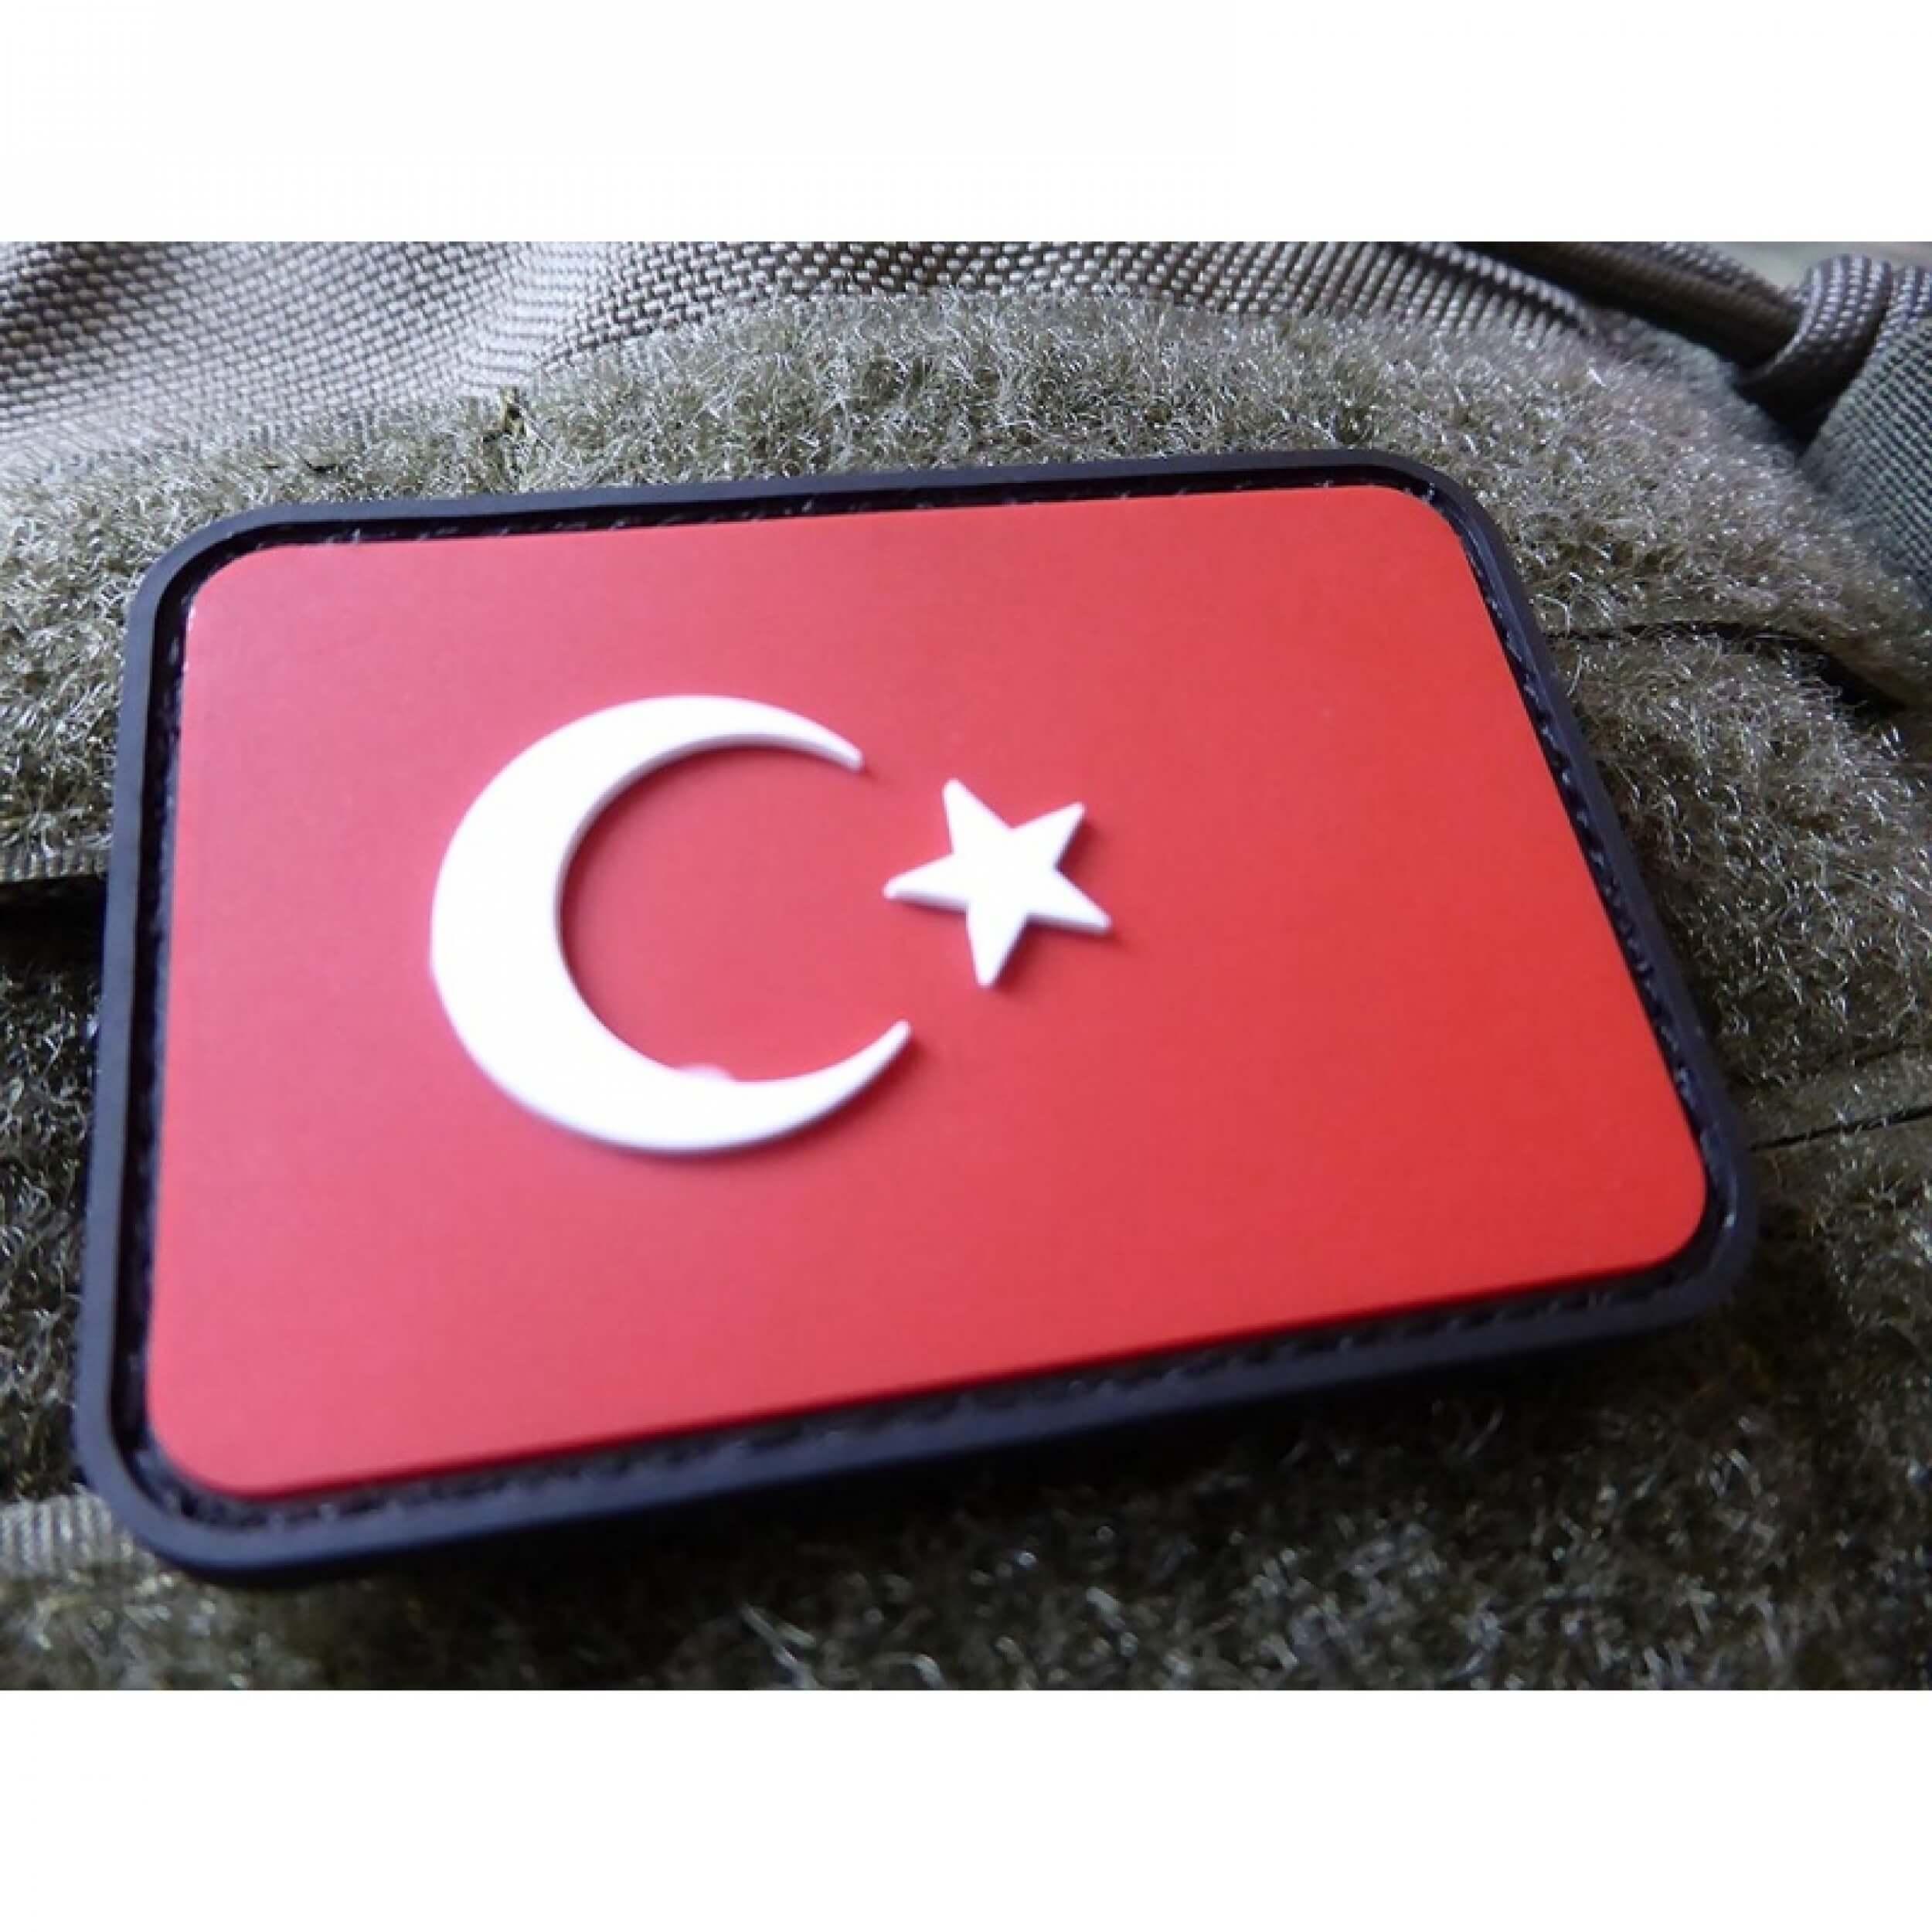 JTG Türkische Flagge Patch, fullcolor / 3D Rubber Patch